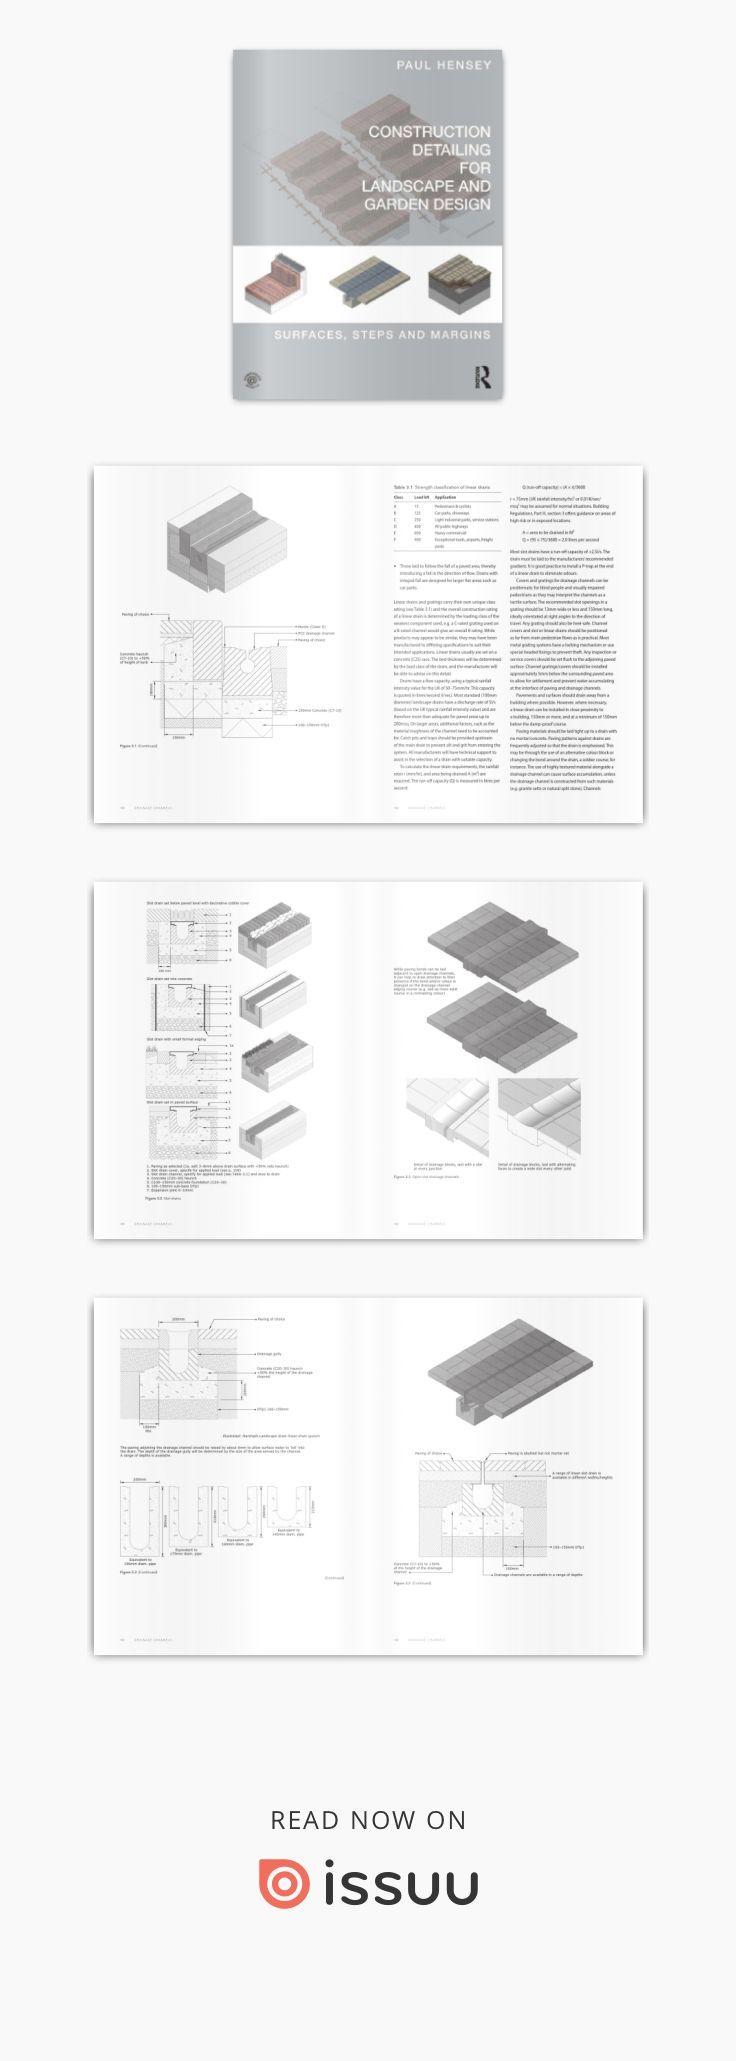 Construction Detail For Landscape And Garden Design Landscape Garden Design Construction